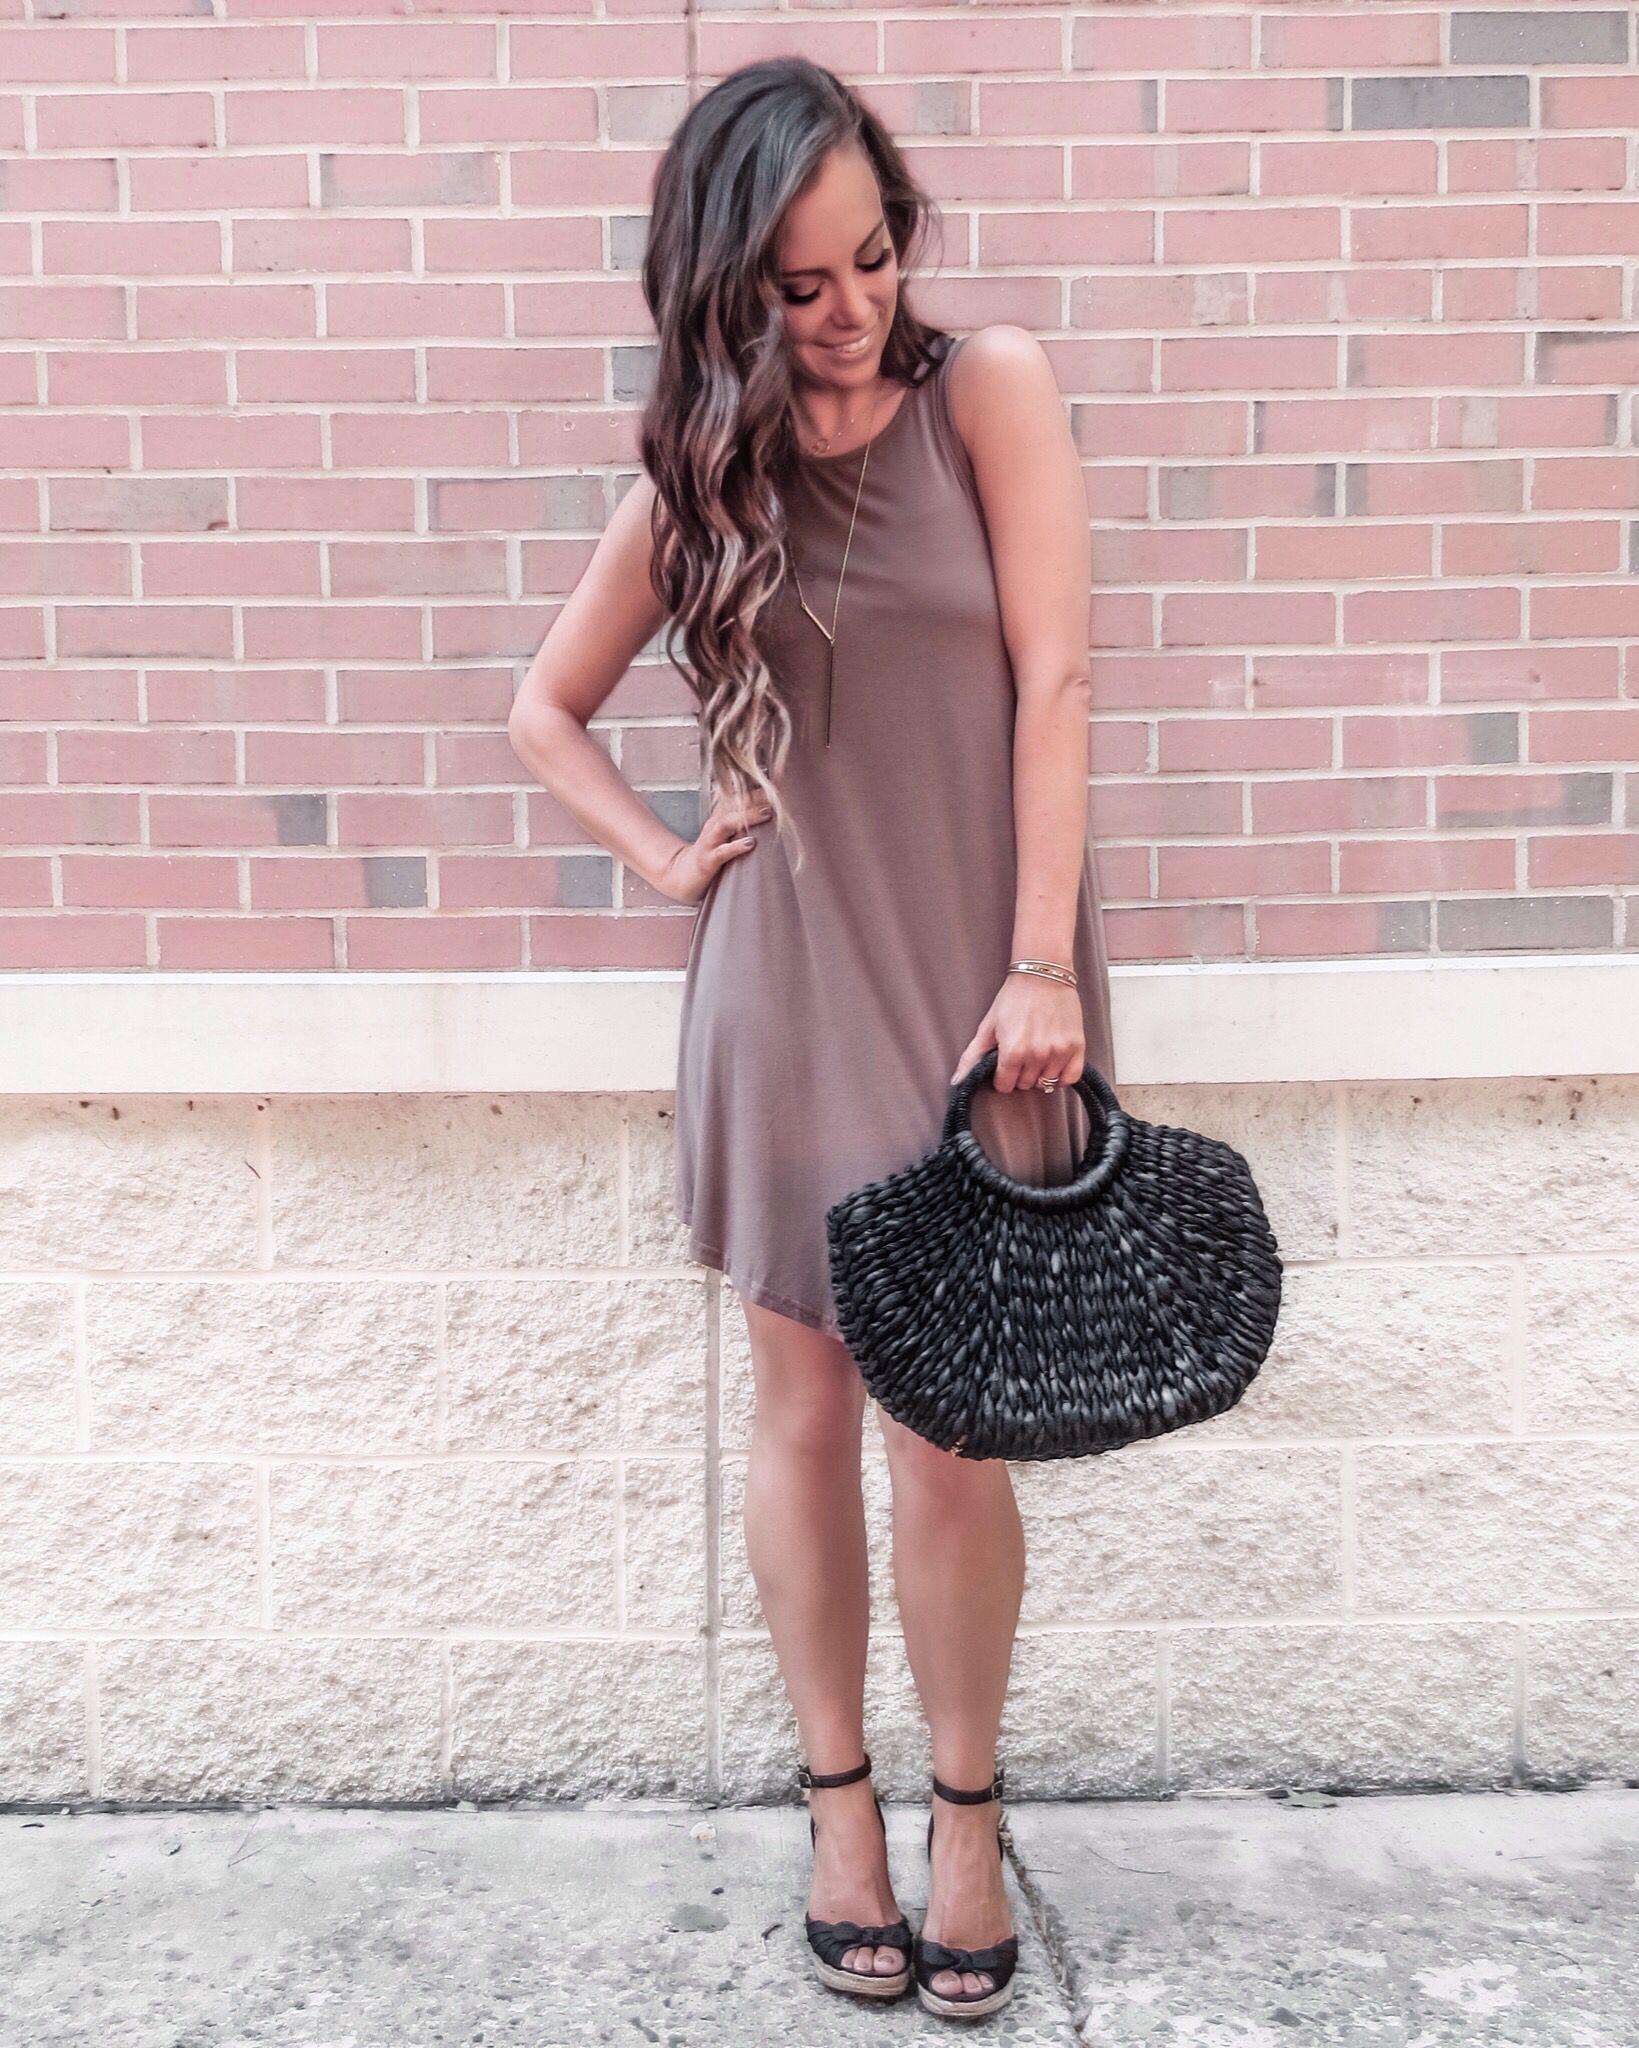 Summer Swing Dress Amazon Dresses Summer Swing Dresses Swing Dresses Outfit [ 2048 x 1639 Pixel ]